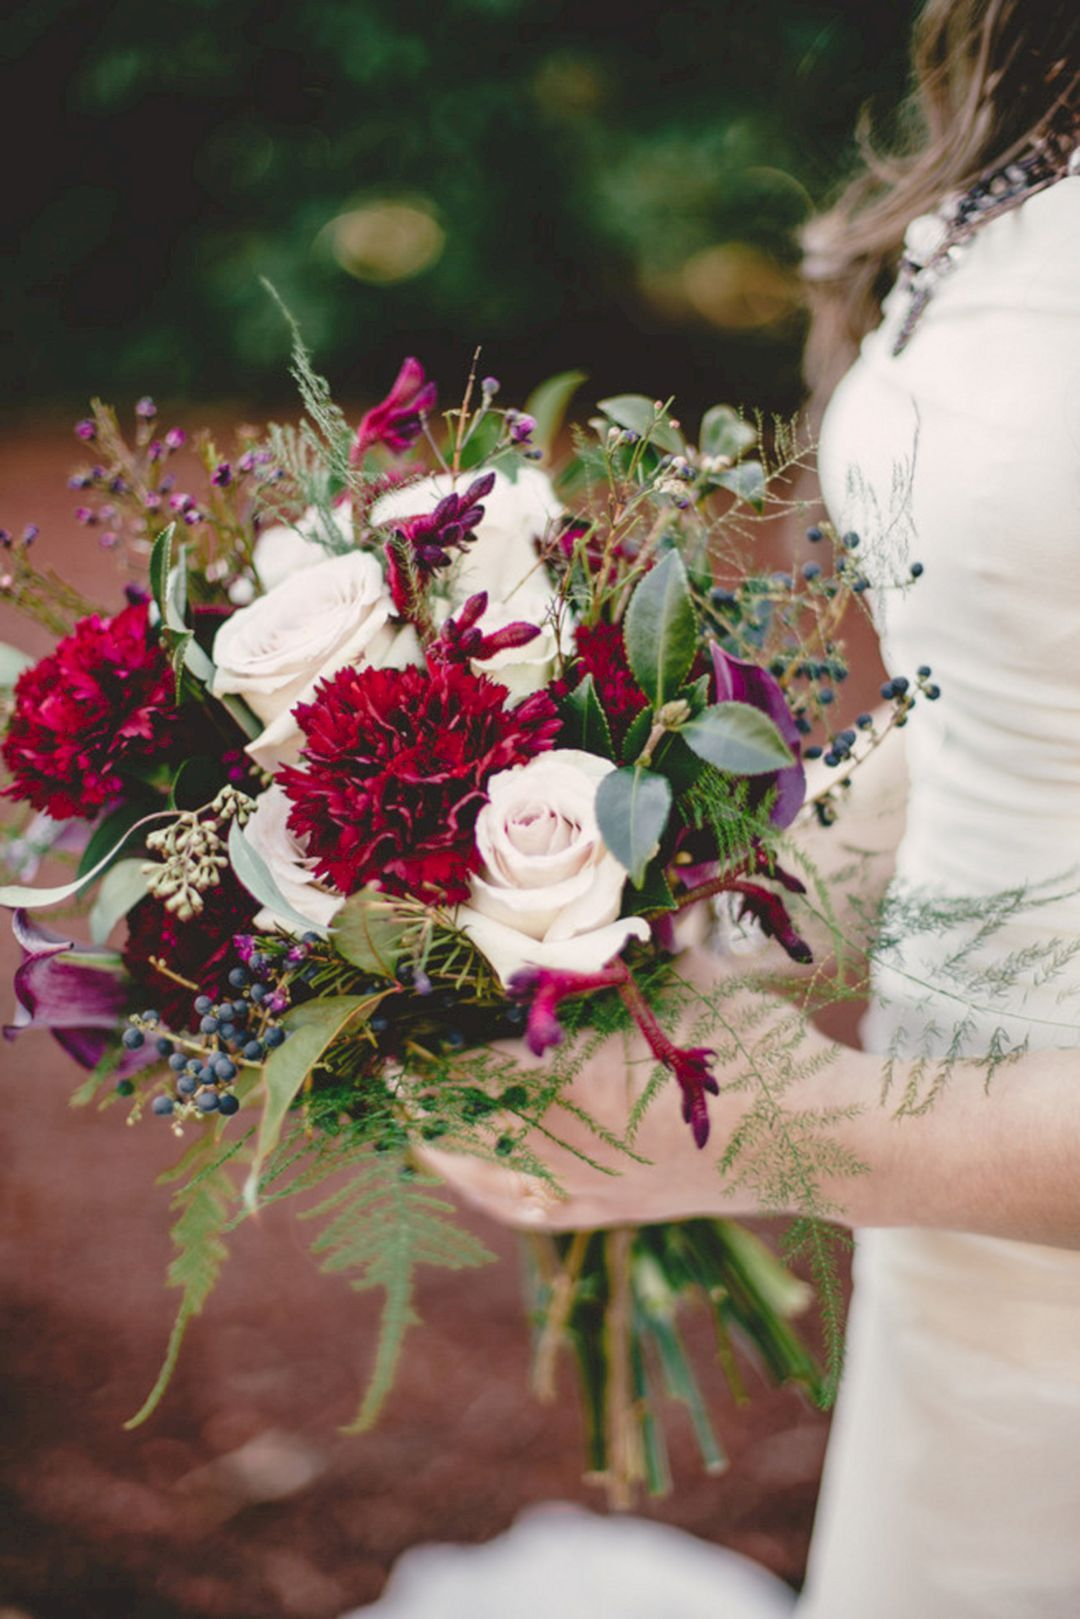 25 Best Burgandy Bouquet Ideas For Your Wedding Day Weddings